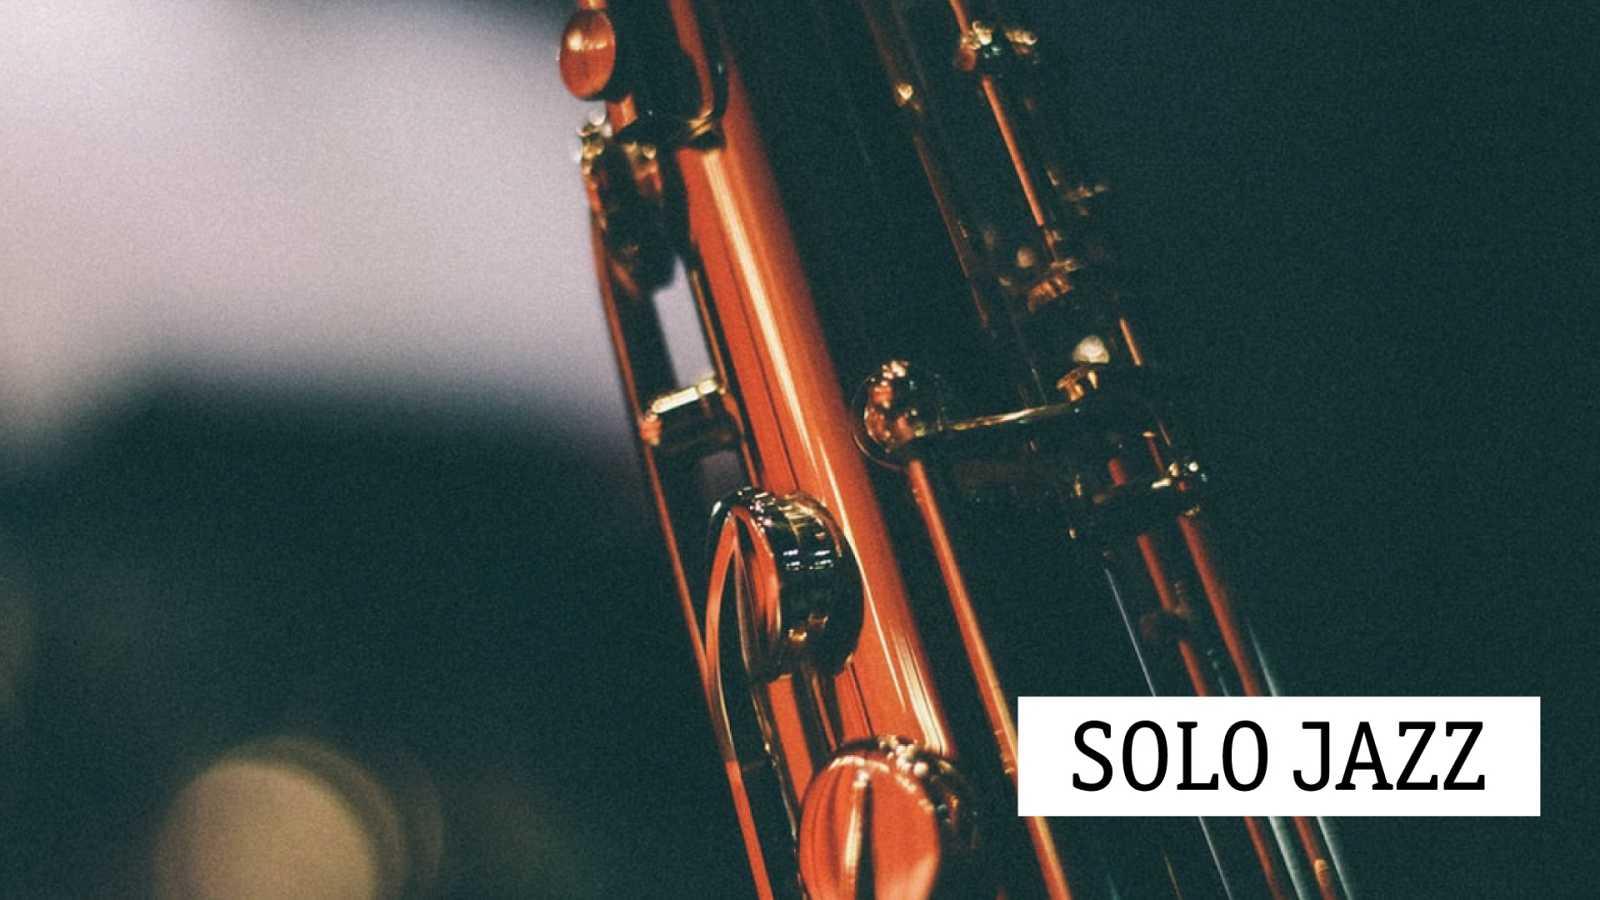 Solo jazz - Bill Evans en el Ronnie Scott londinense, 1968 - 05/03/21